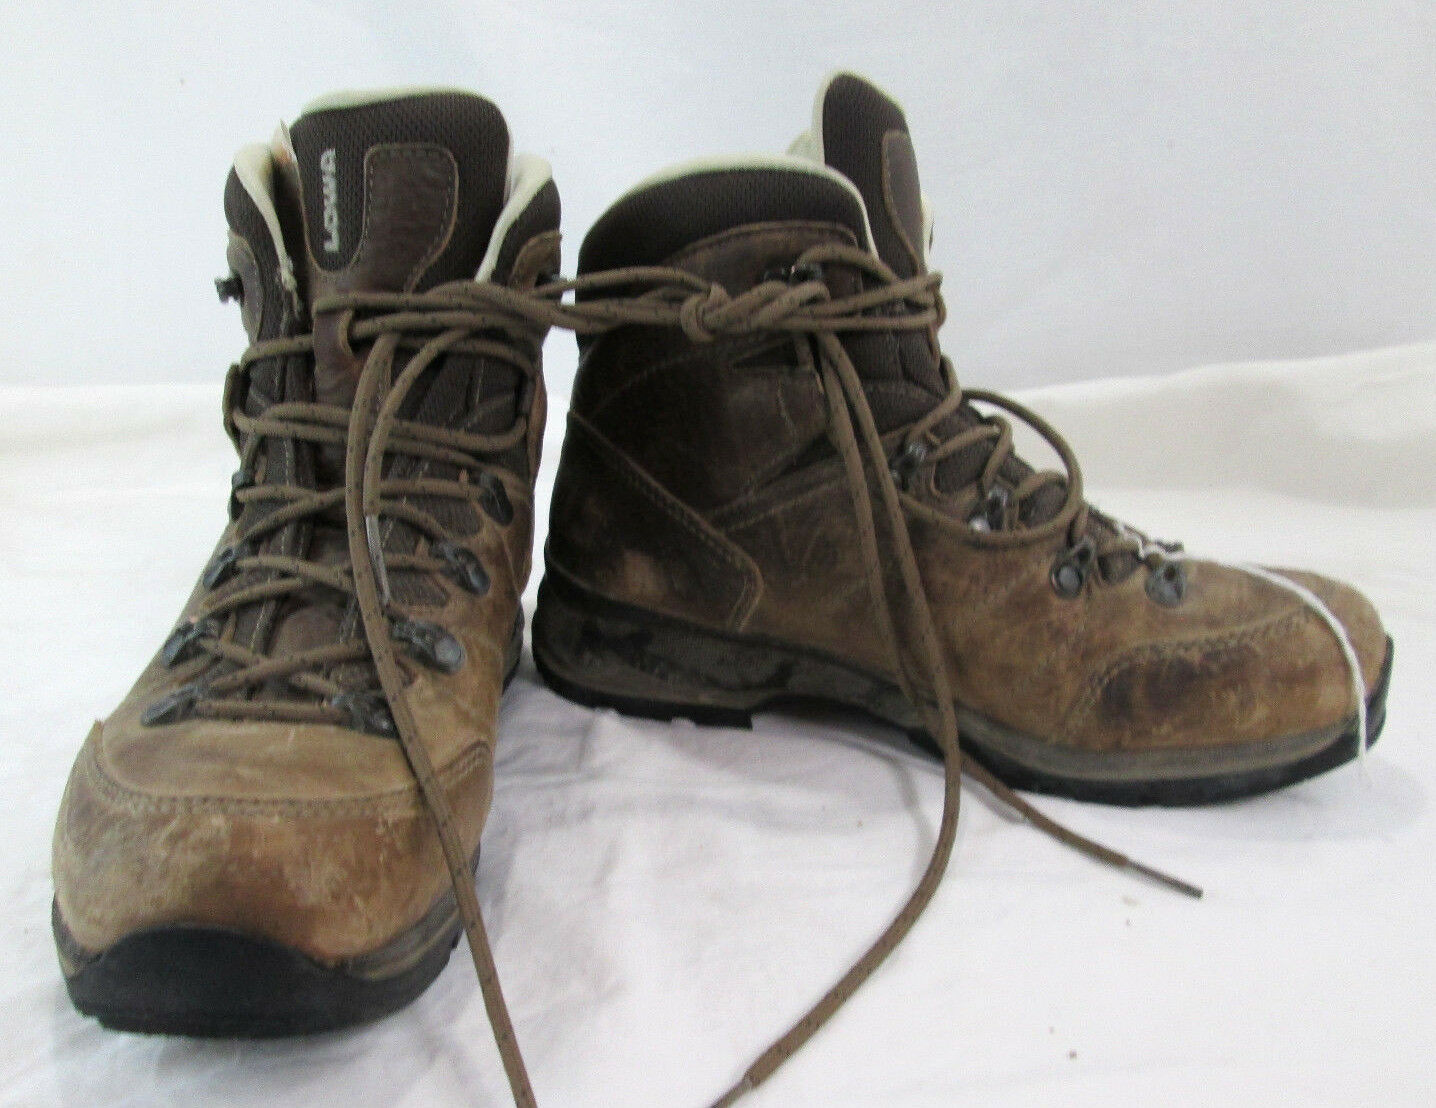 consegna rapida Lowa Hudson donna 6.5 Mid high high high Hiking avvio Marrone Leather shoe  bellissimo